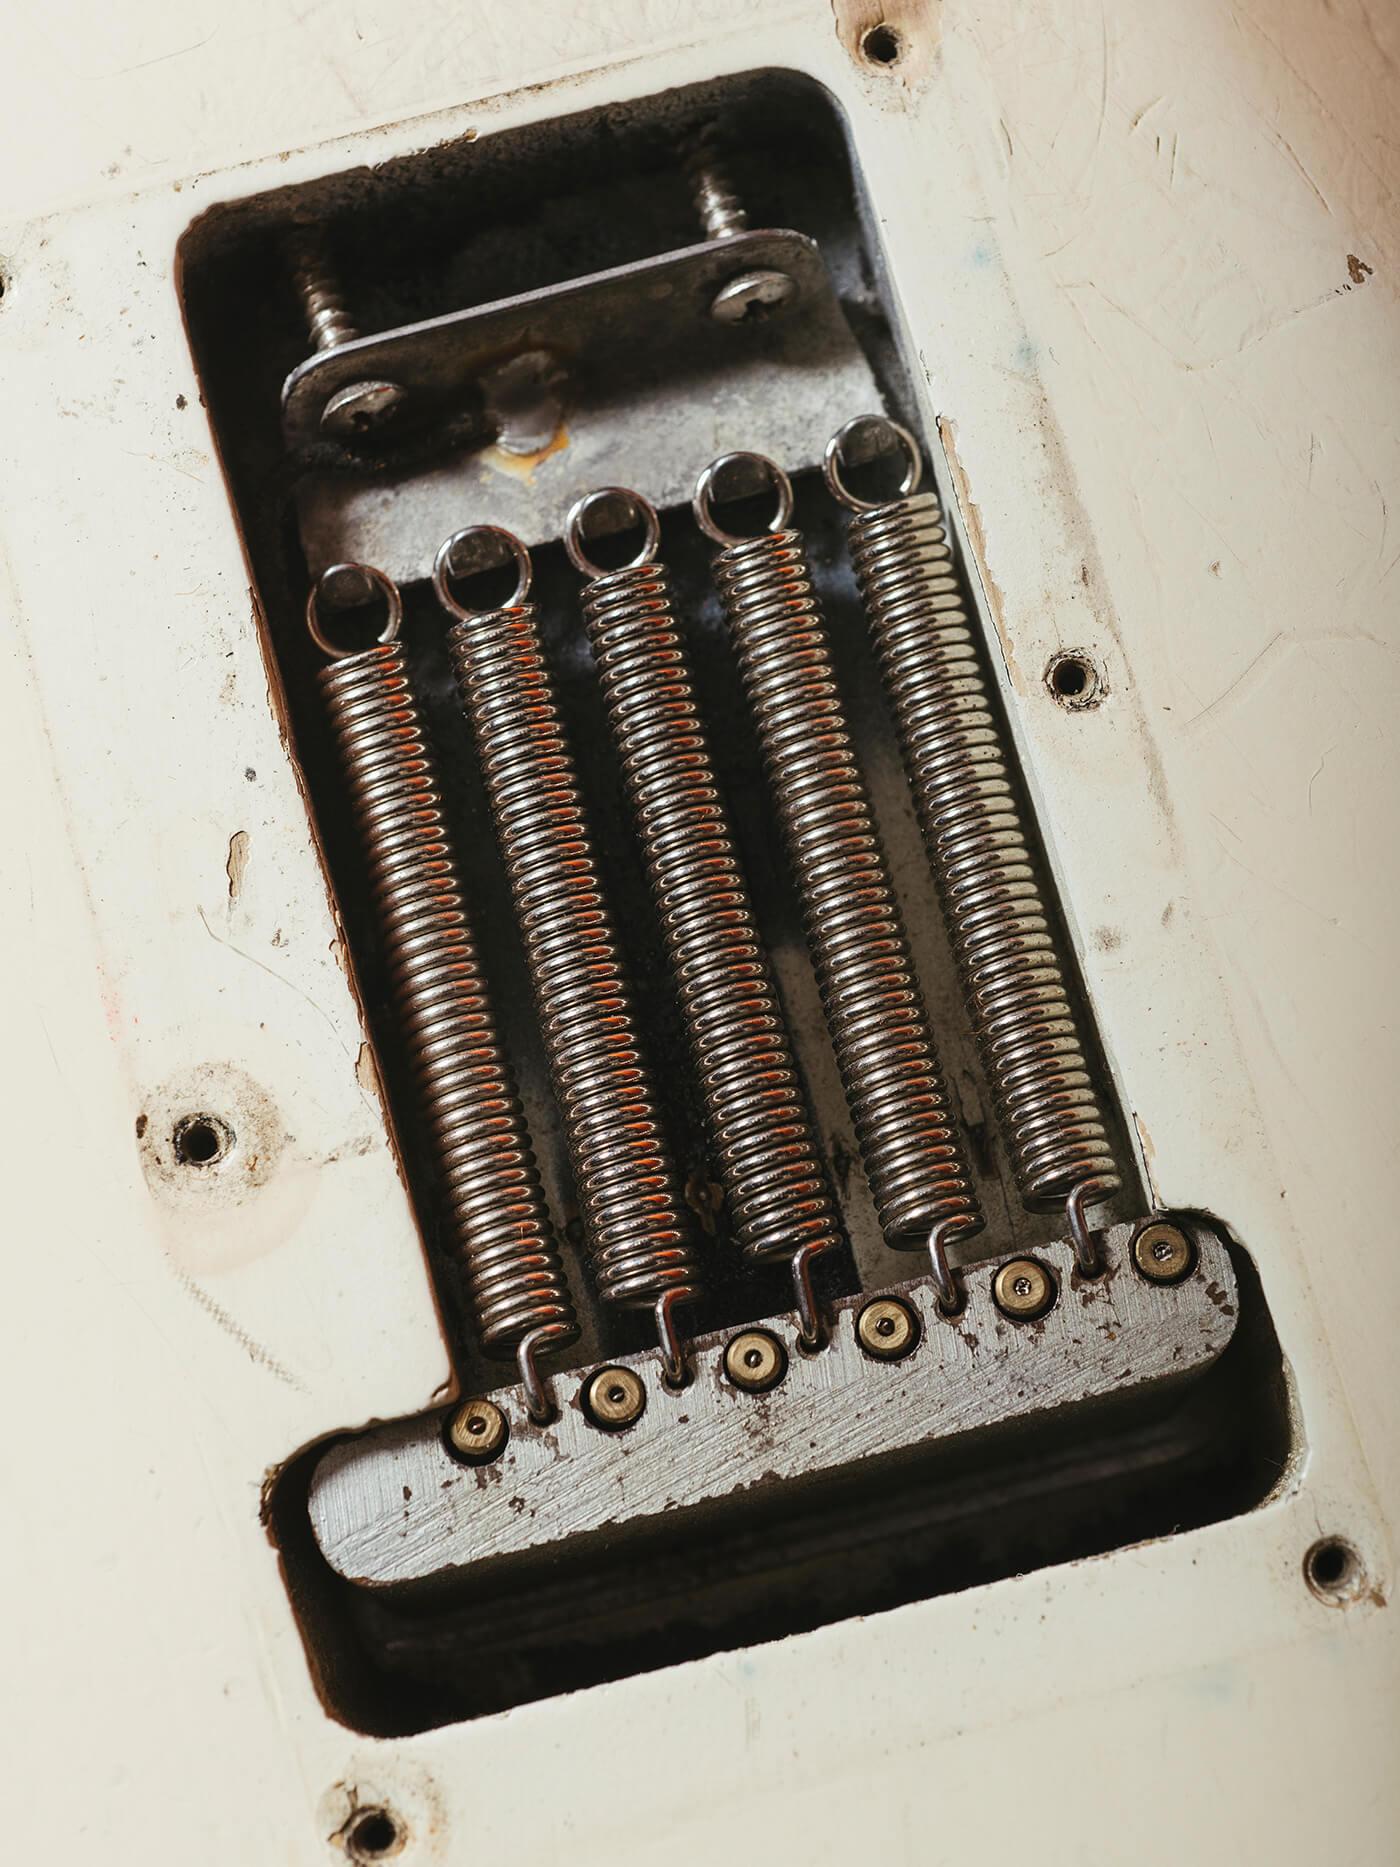 Fender Jimi Hendrix 63 springs